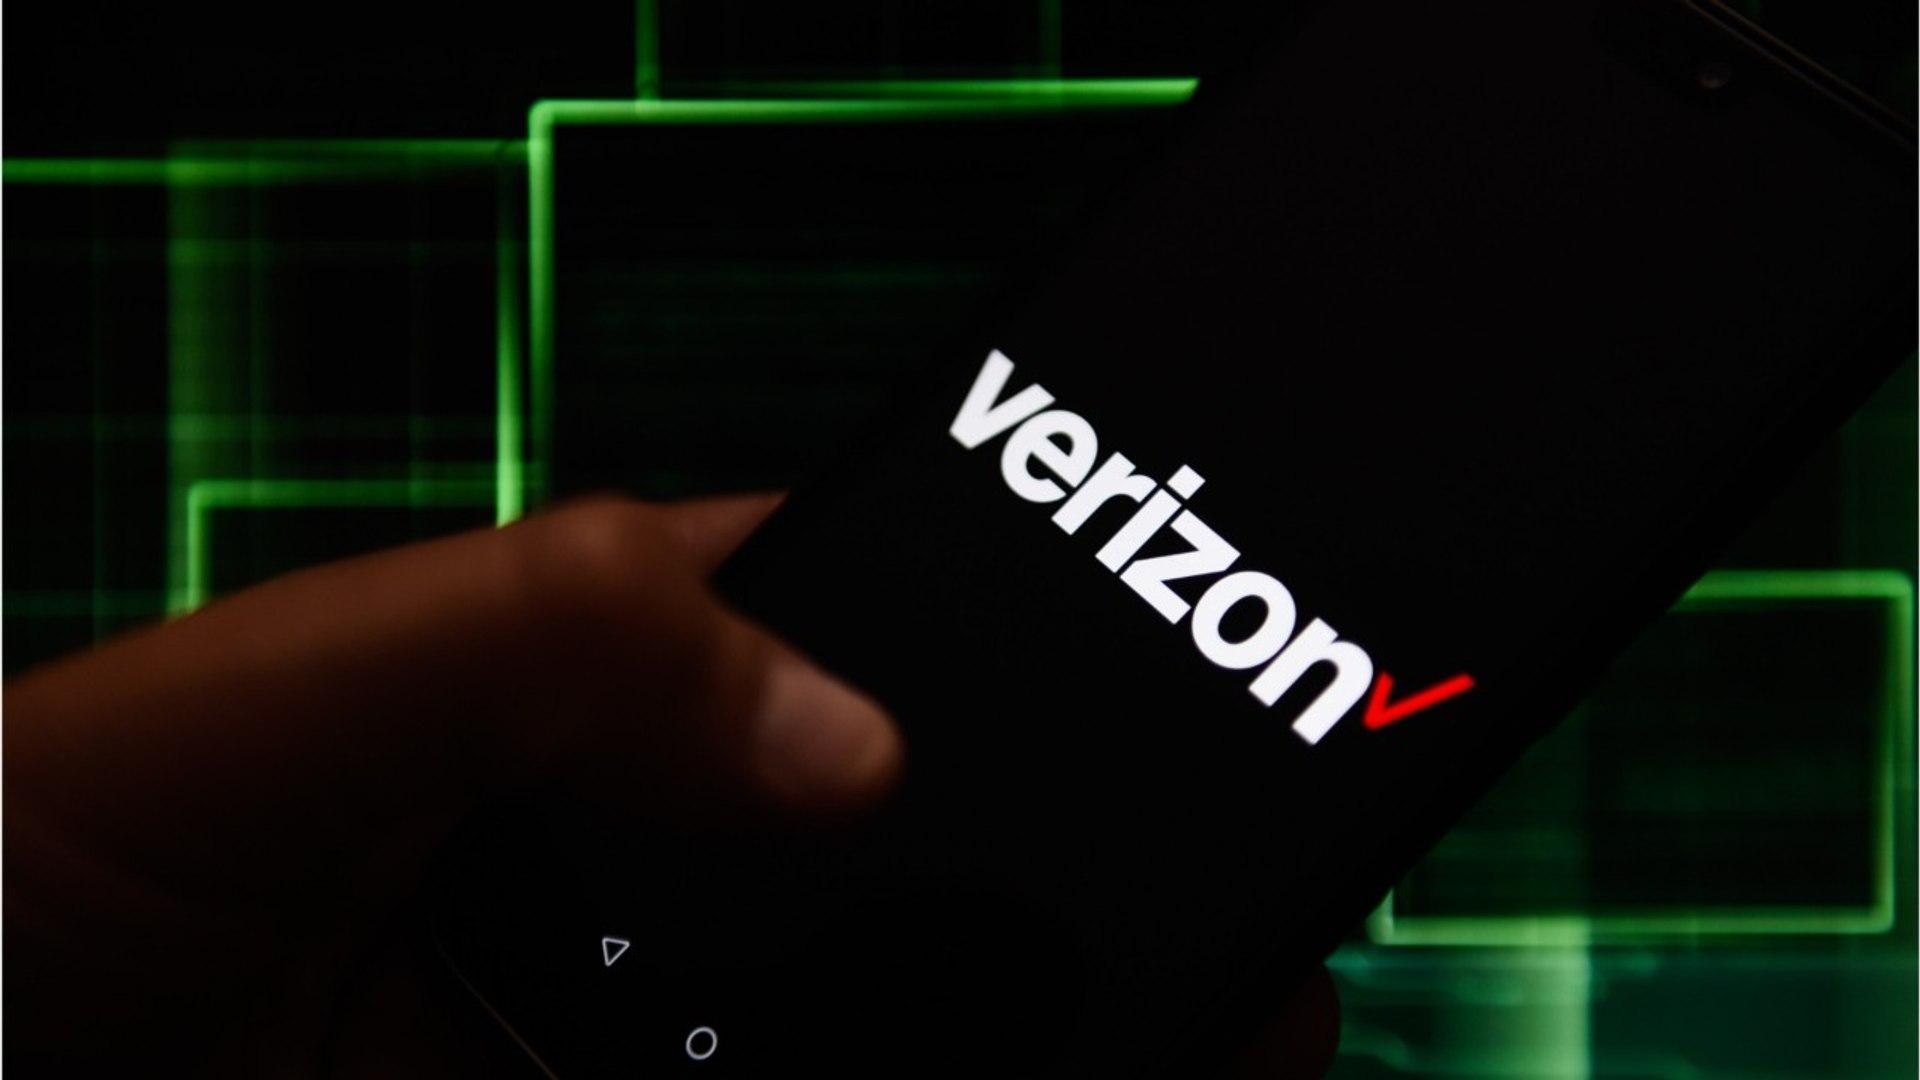 Verizon Meets 2019 5G Coverage Goals